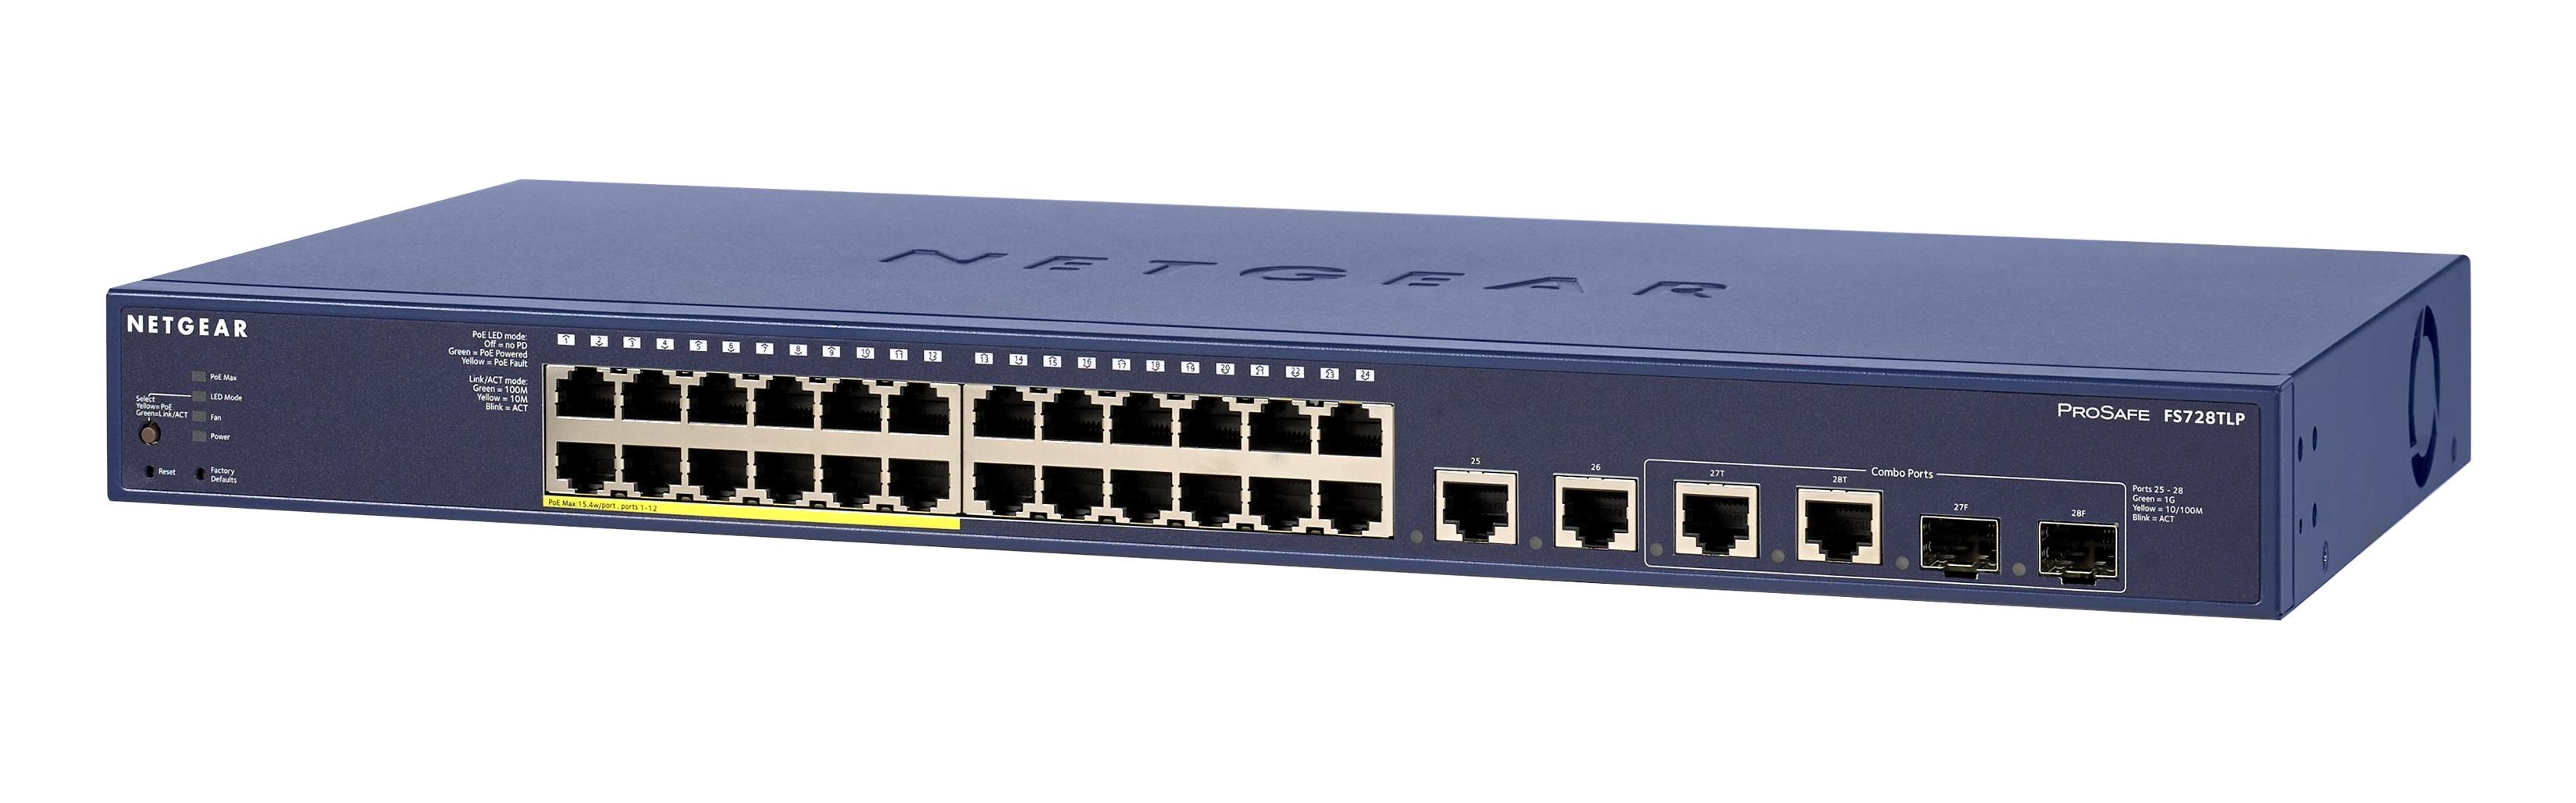 Netgear Smart Switch 24x10/100, 12x PoE, 2xGigabit 2xCombo 100W (FS728TLP)